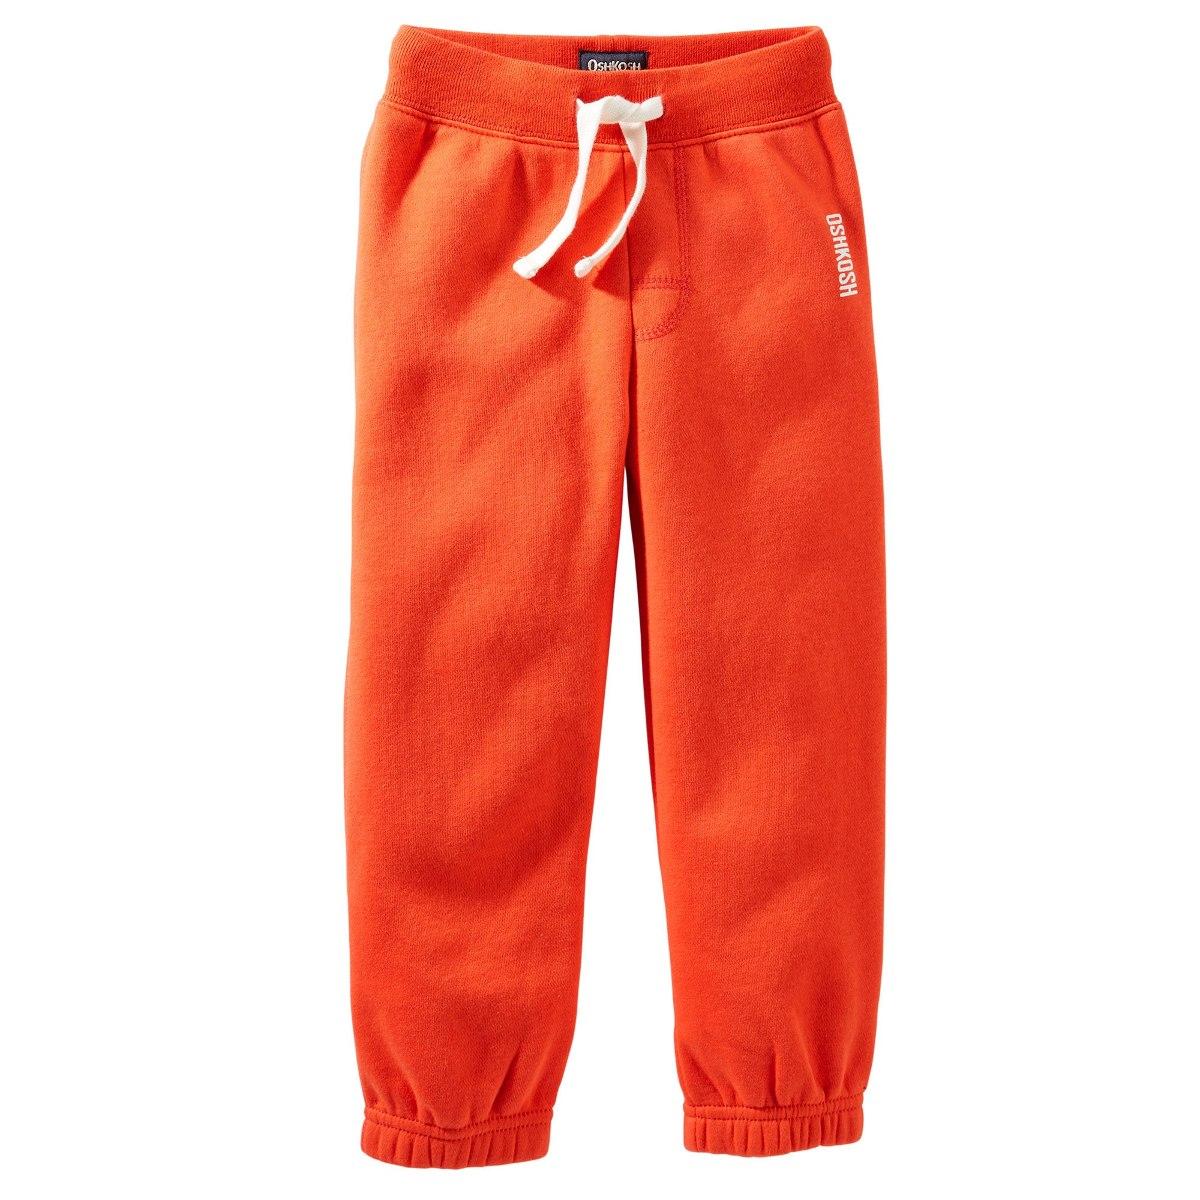 Oshkosh Bgosh - Pantalon Naranja C puño Para Niño - Talla 5t - S  60 ... 89841cc940f9